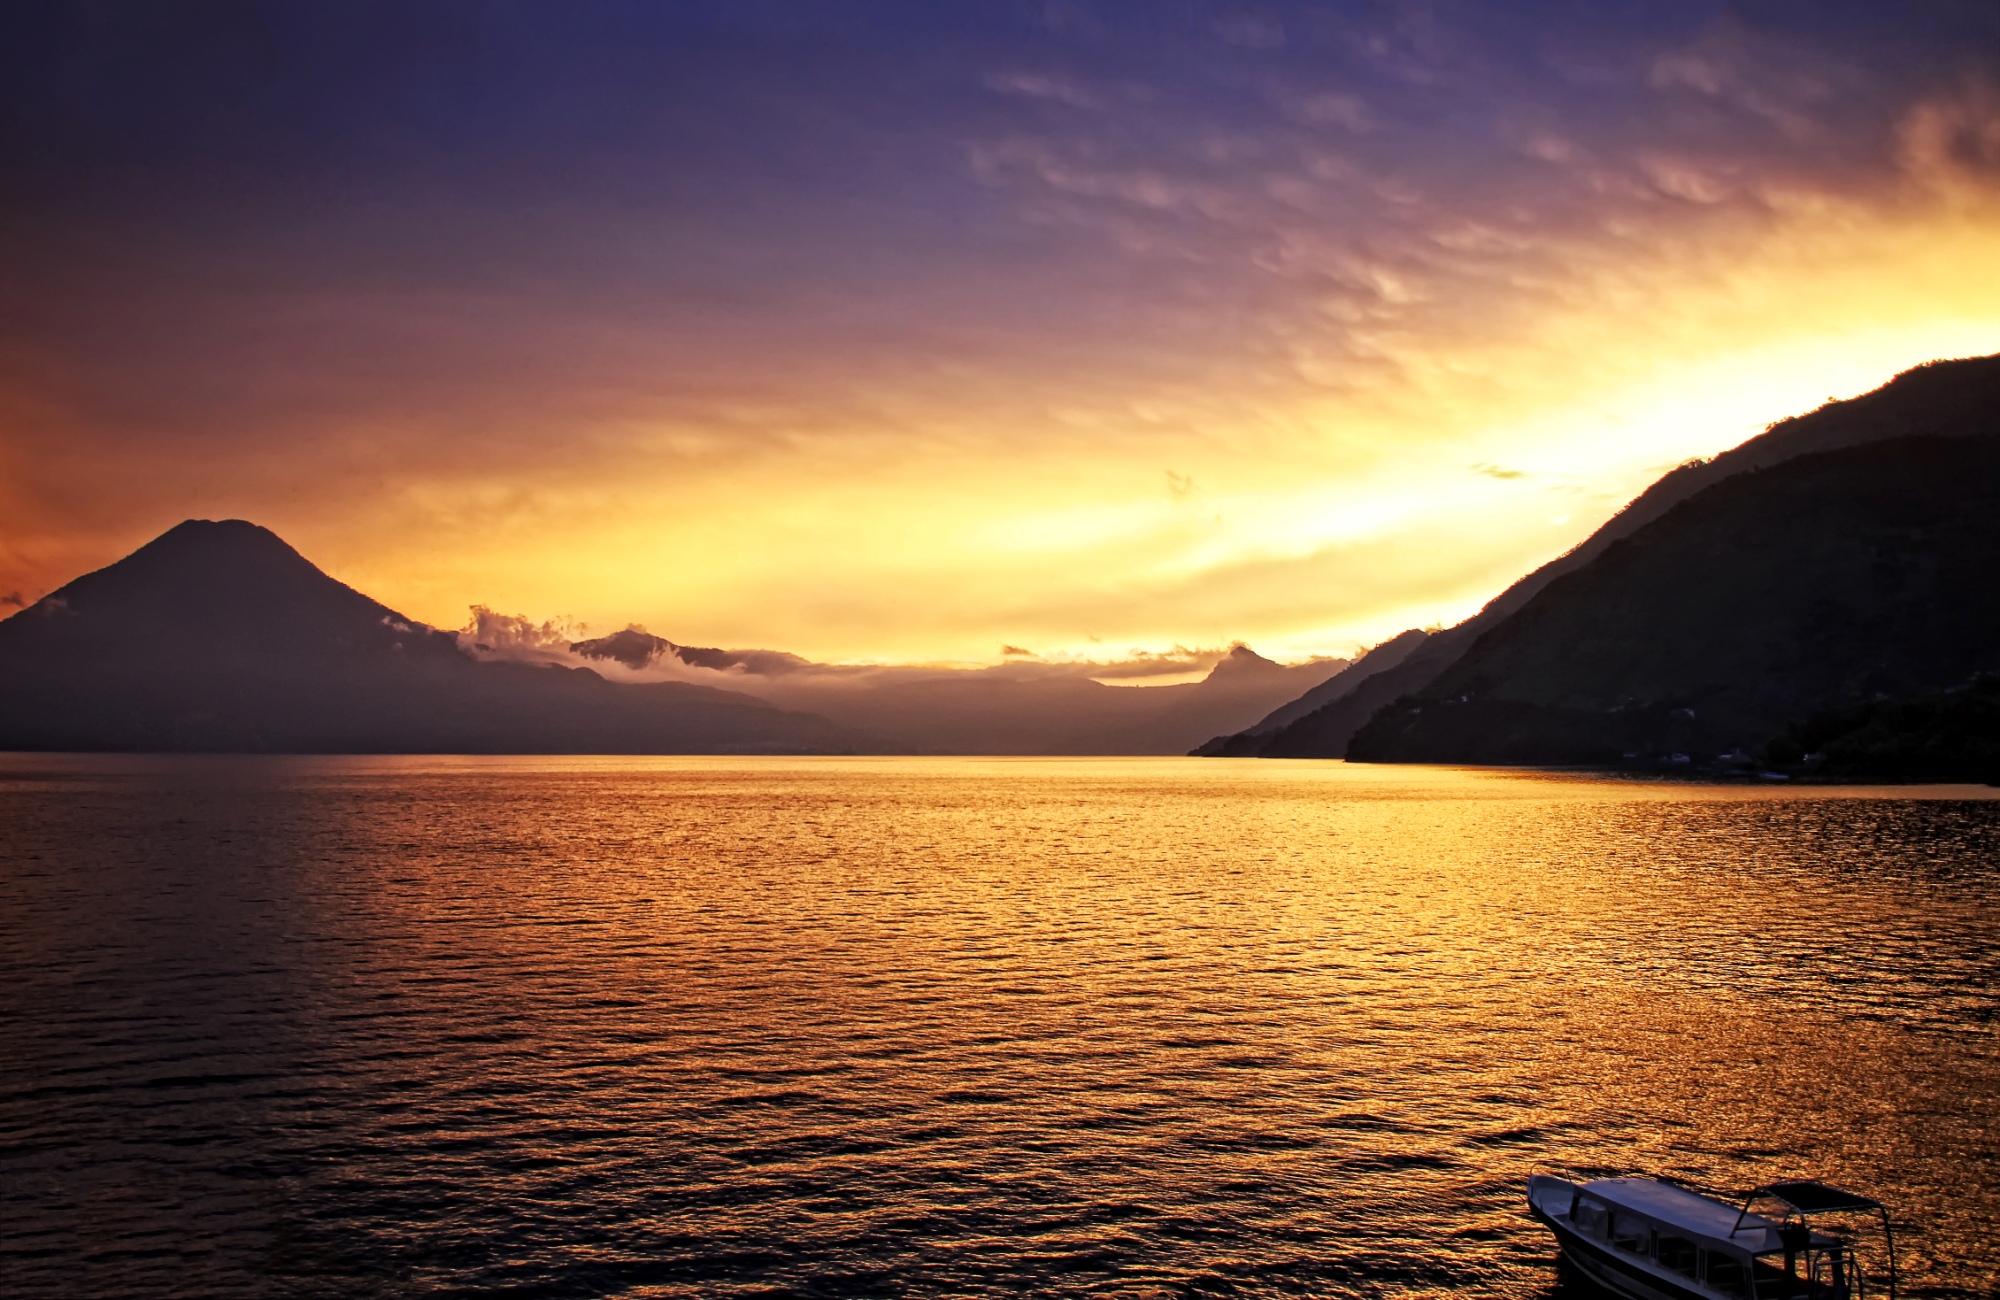 Voyage Guatemala - Lac Atitlan - Amplitudes